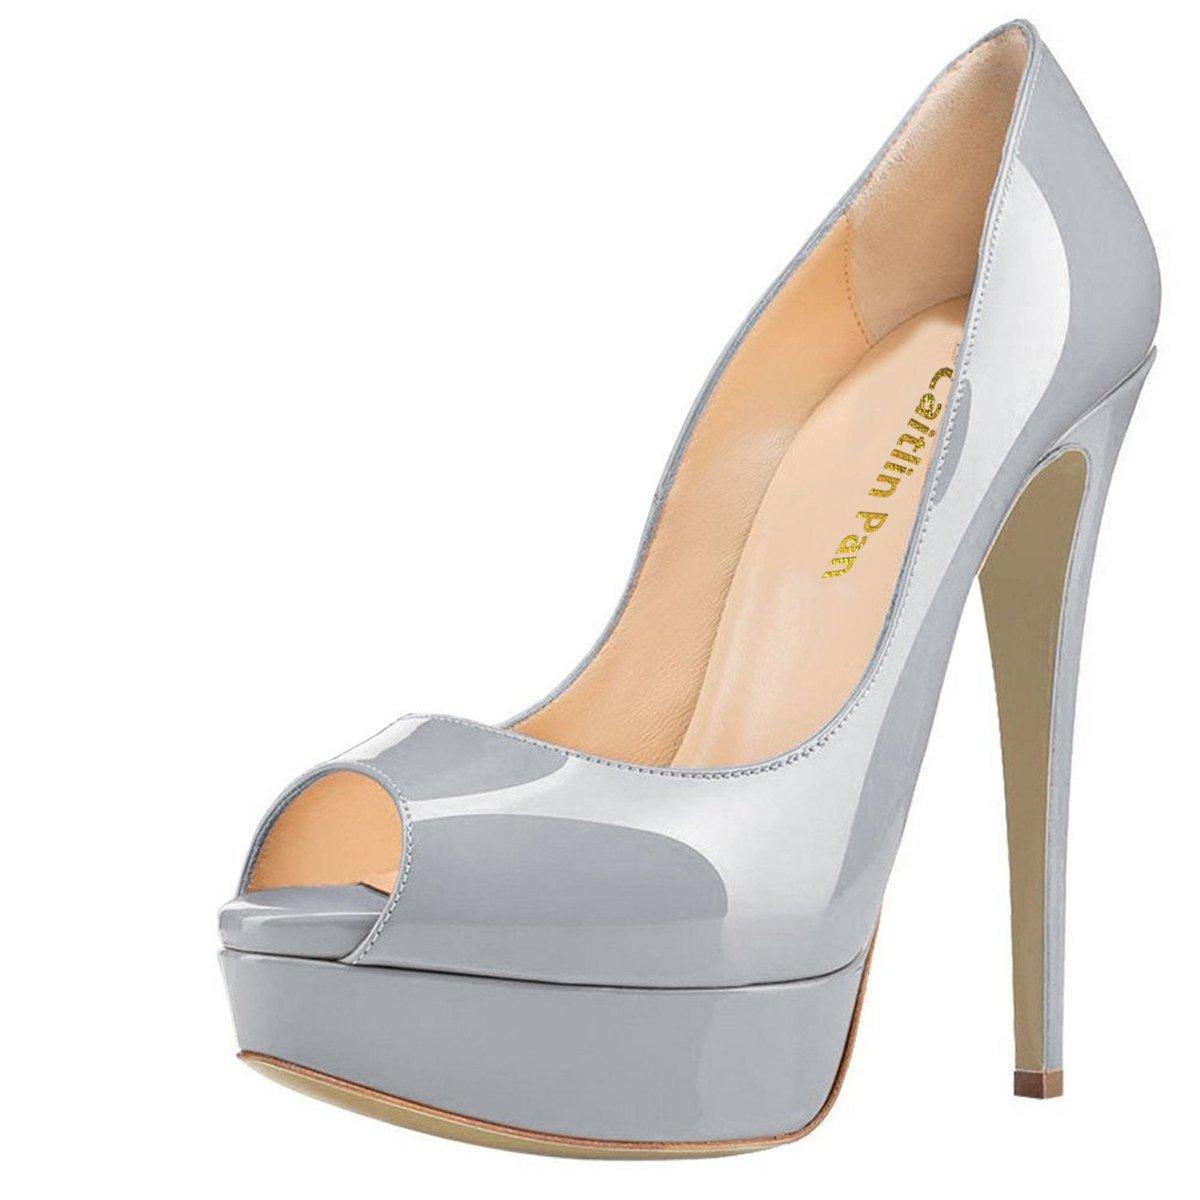 Caitlin Pan Donna Tacchi Alti Slip On Pompe Stiletti Piattaforma Peep Toe Festa Sandali Dress Scarpe col Tacco